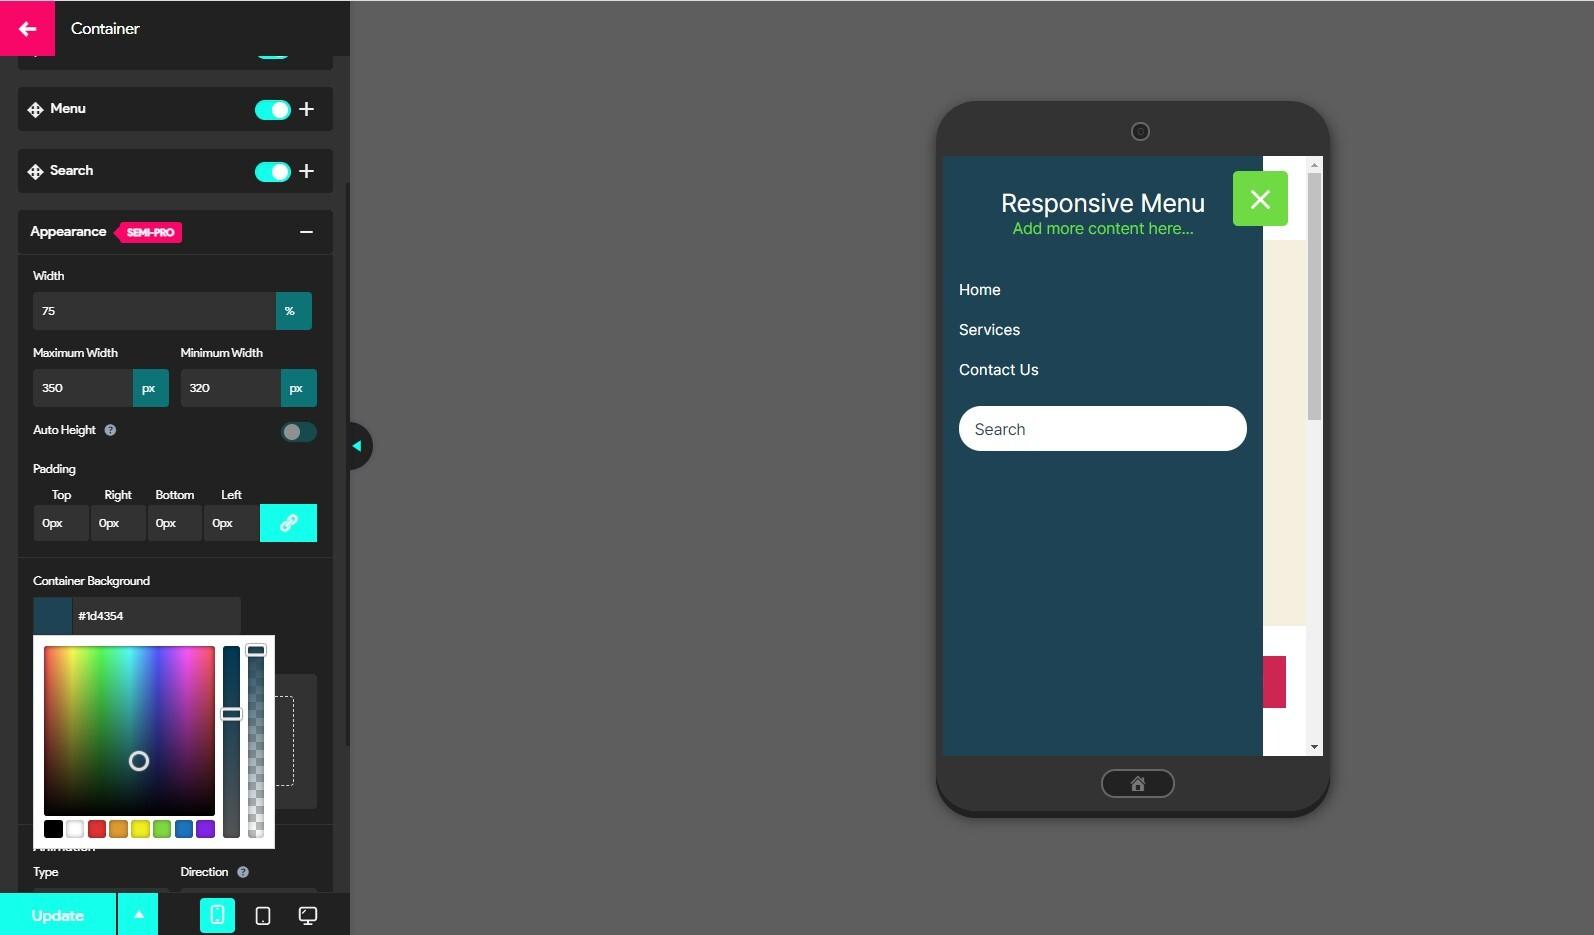 Responsive Menu v4.1.2 introduces Dark Mode - Dark Mode in Action